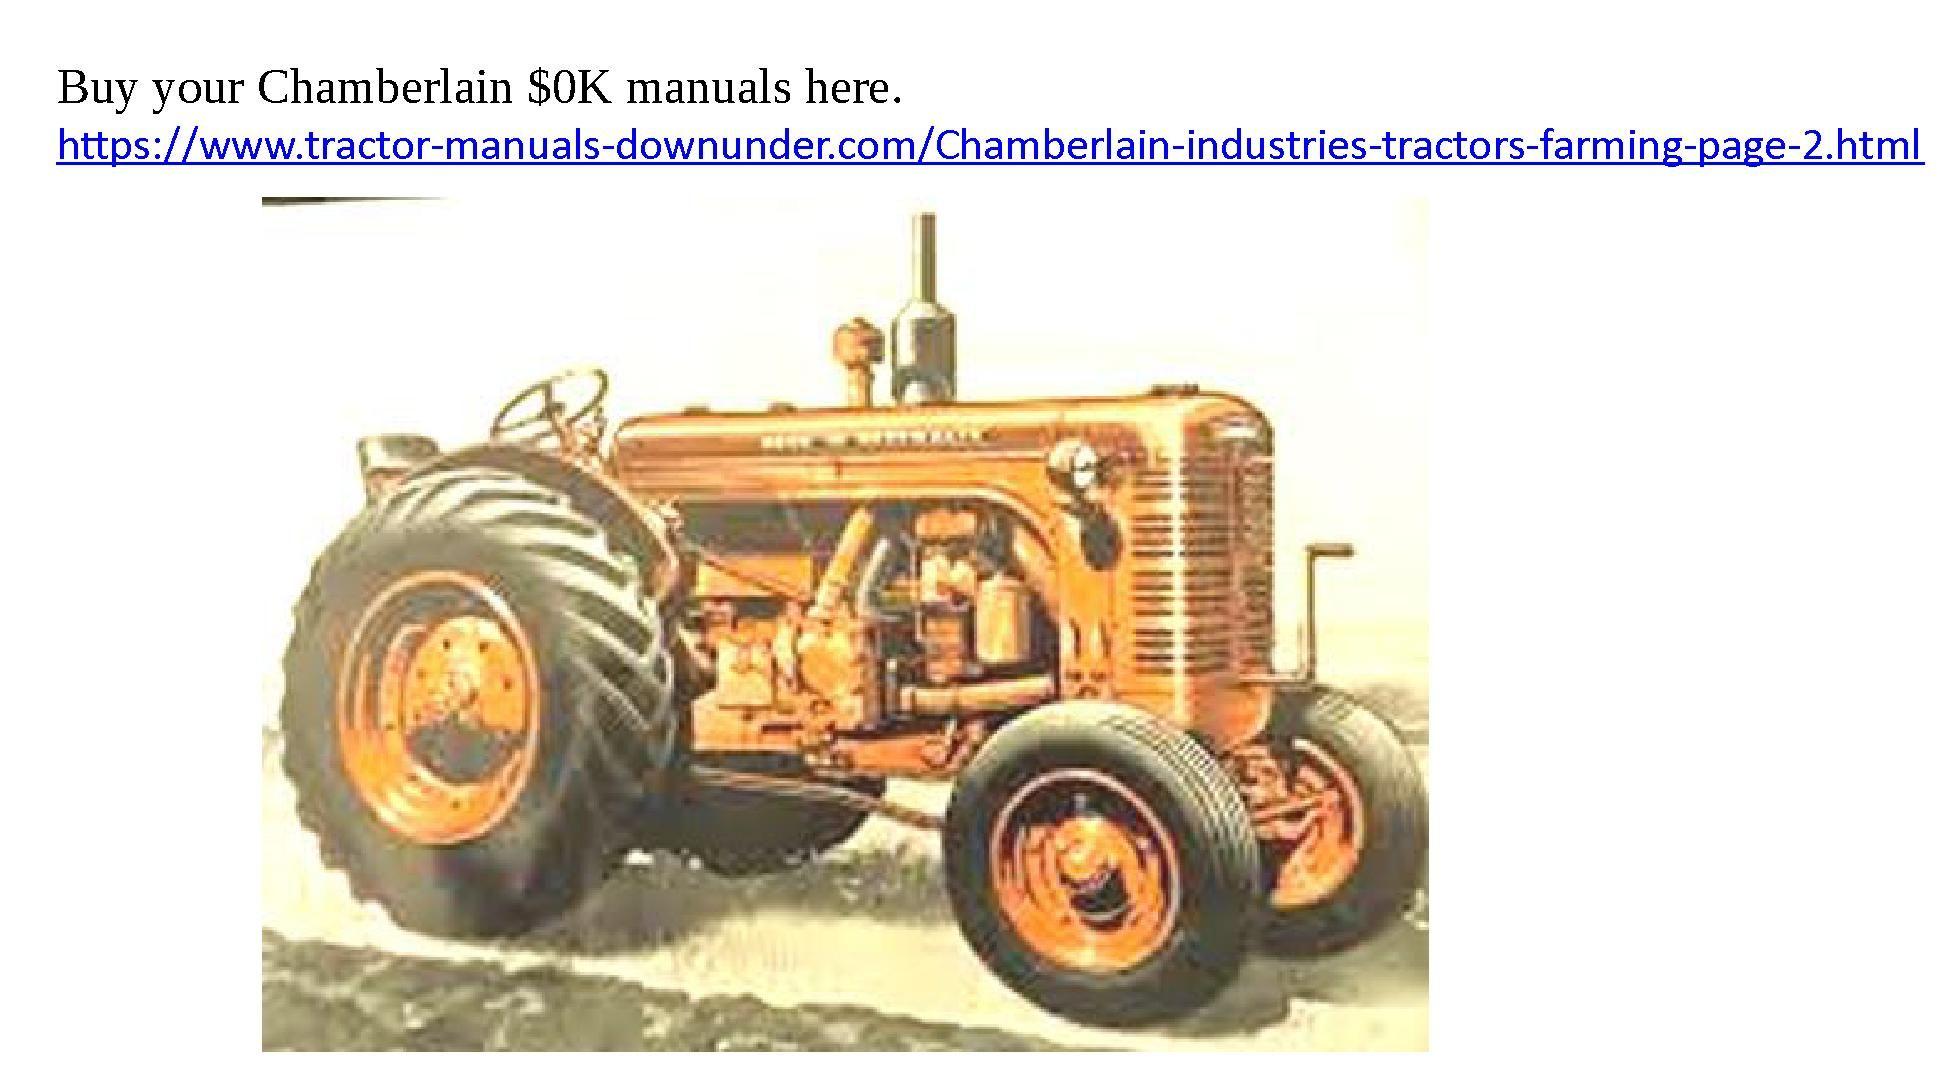 40k 40ka etc manuals to download chamberlain tractors pinterest rh pinterest com